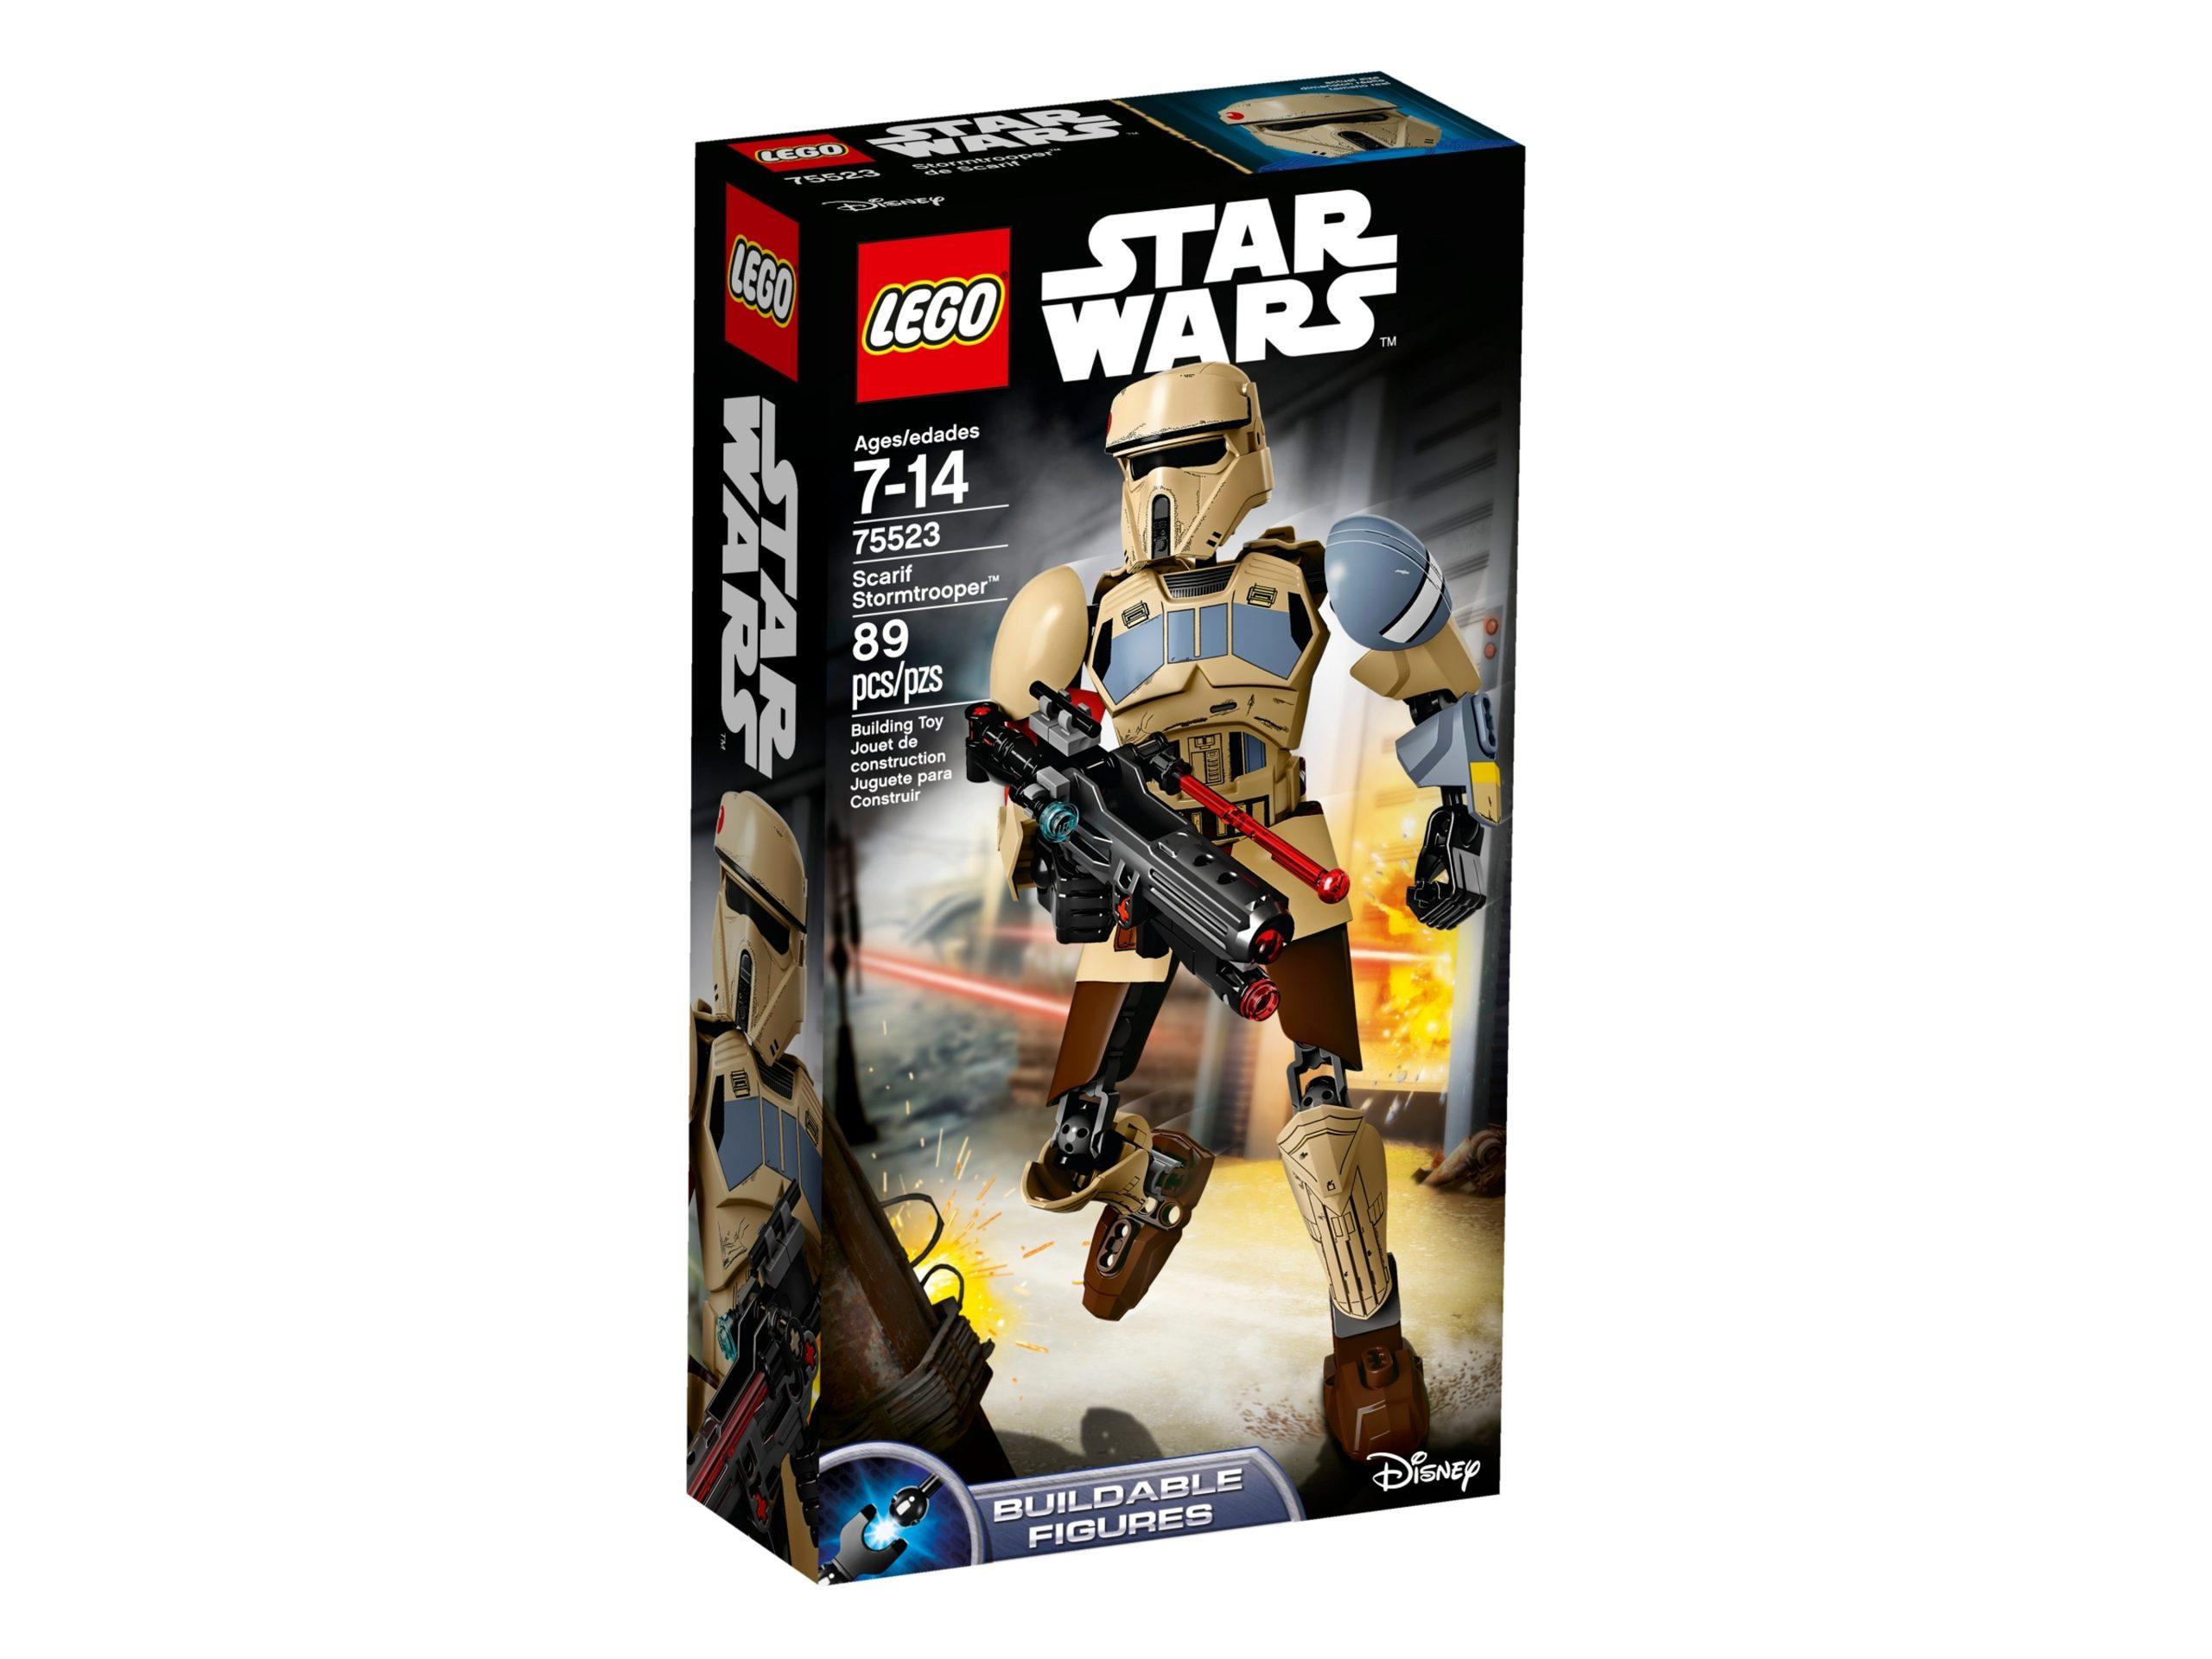 lego 75523 scarif stormtrooper scaled